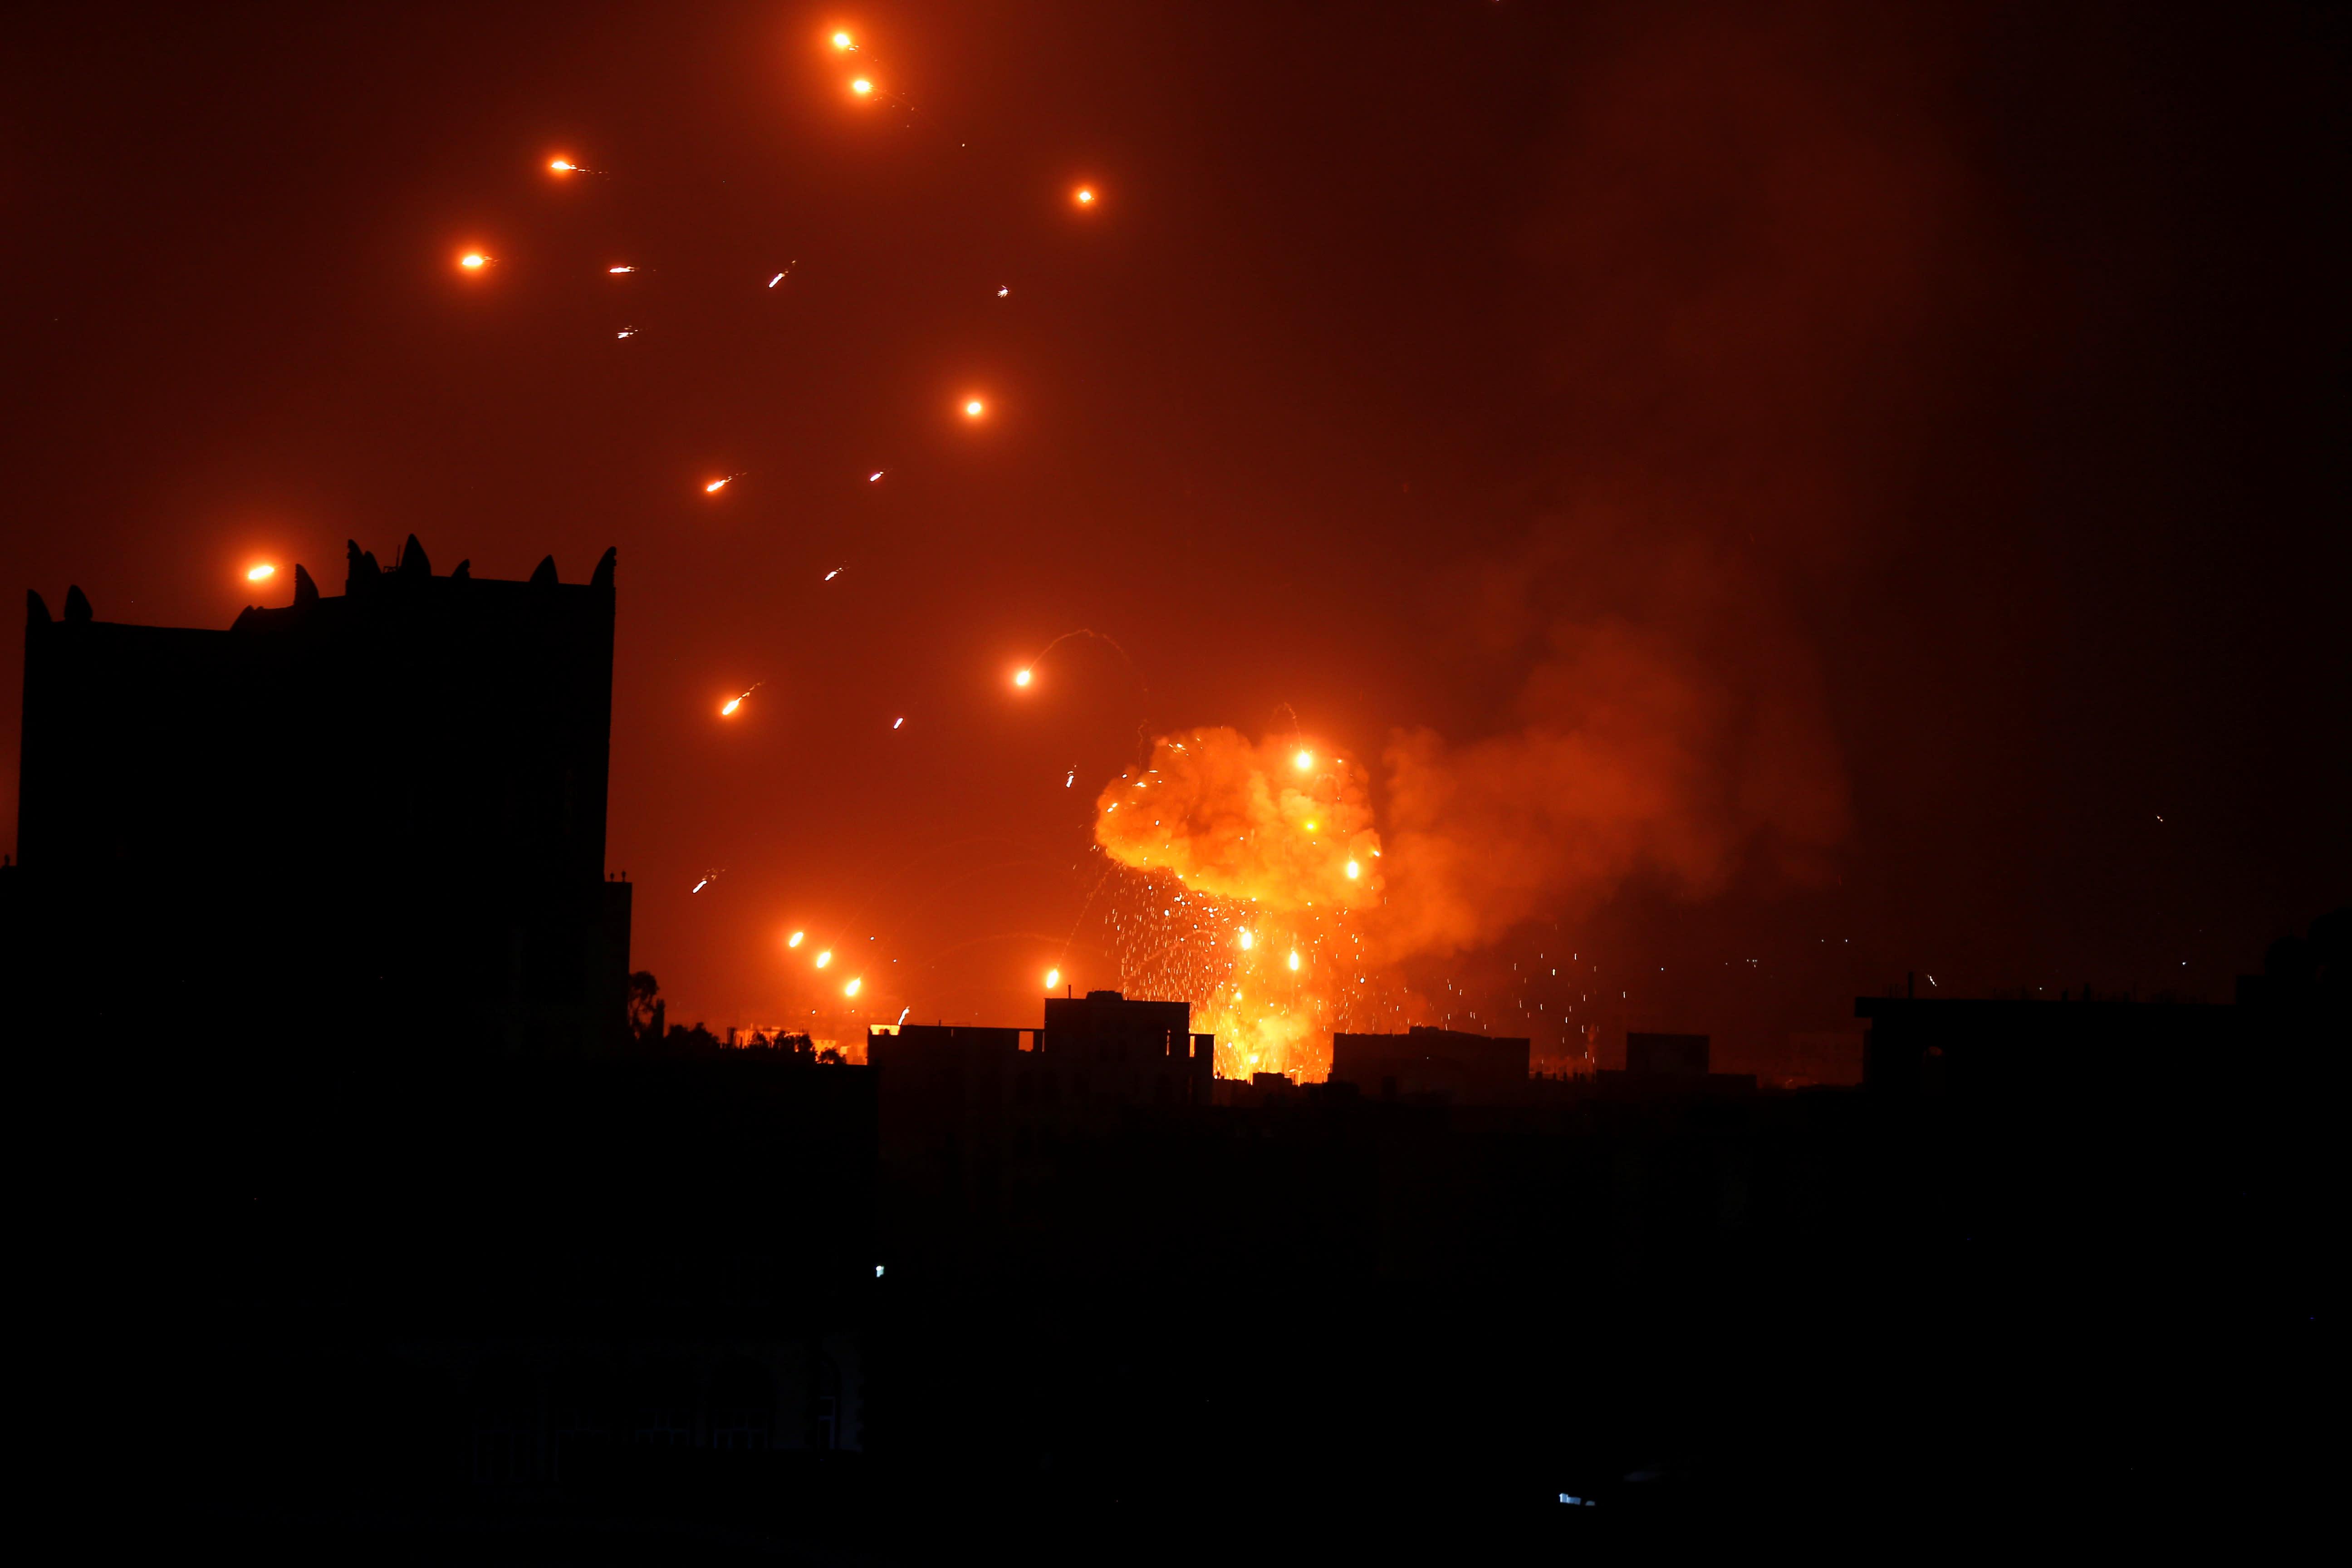 Despite denials, documents reveal U.S. training UAE forces for combat in Yemen